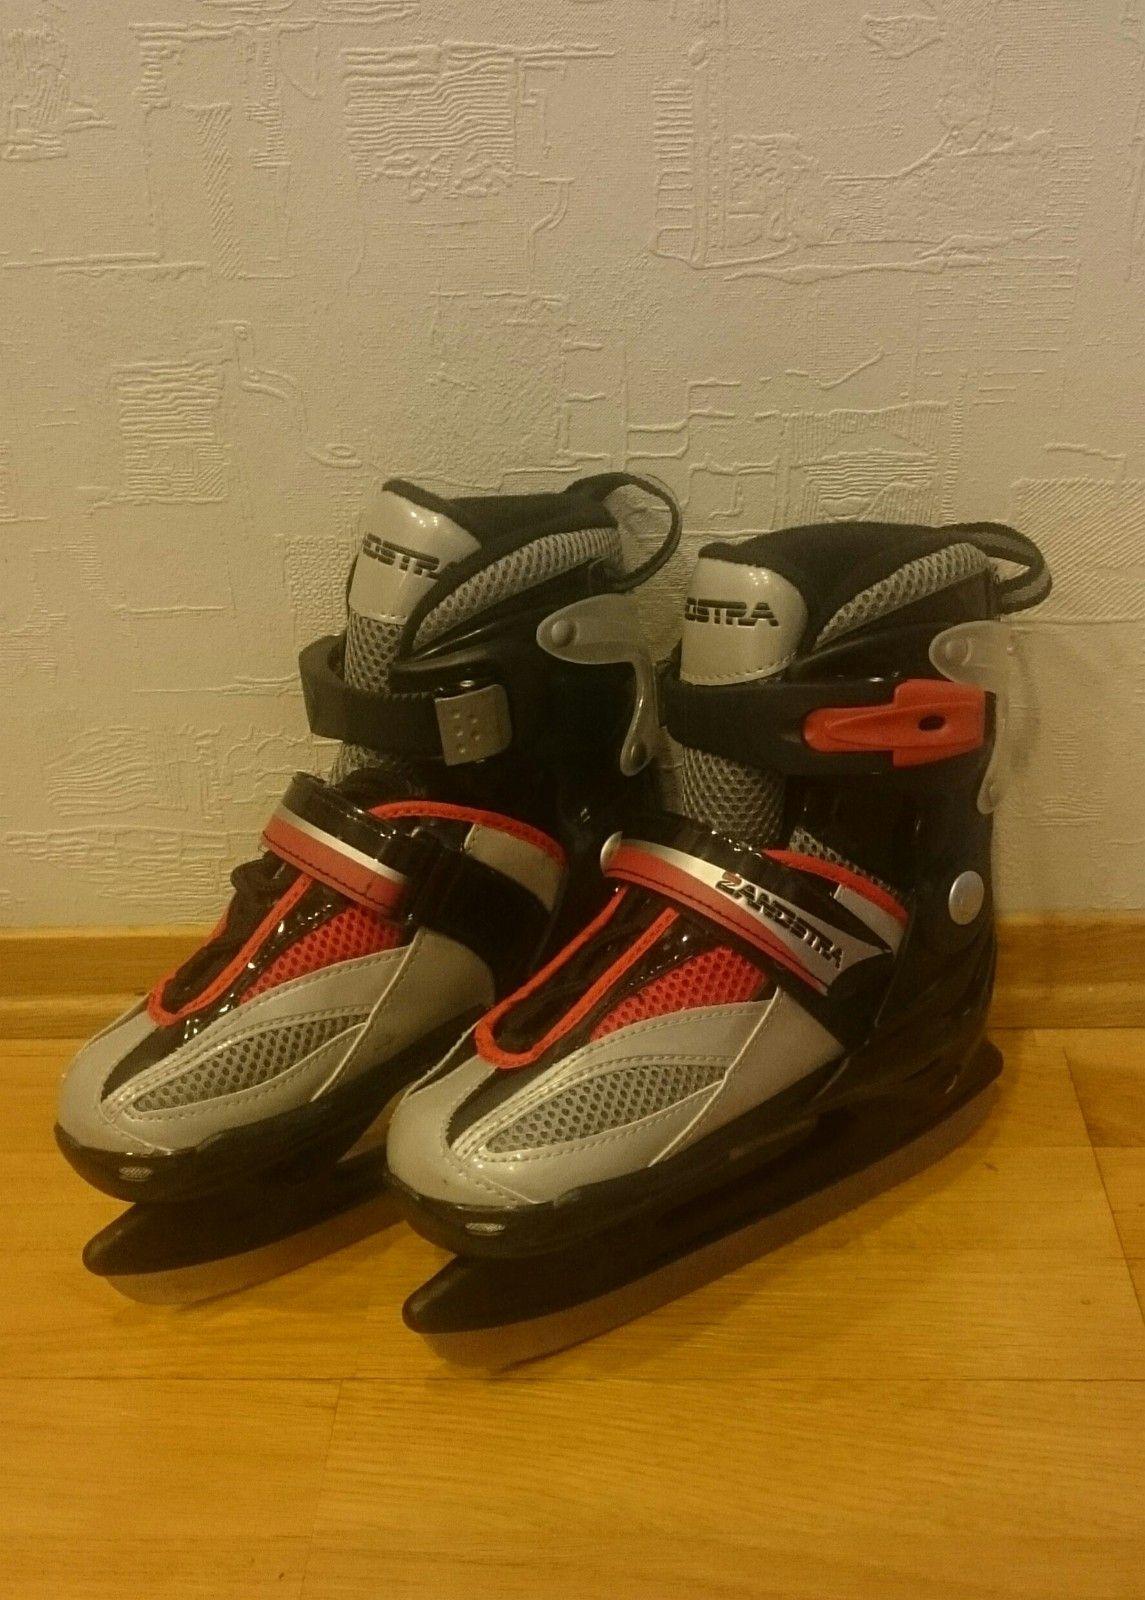 Kids adjustable ice skates. Size 27-30 - Trondheim  - Kids ice-skates. Adjustable size, 27-30. Good condition. Made by Zandstra. - Trondheim